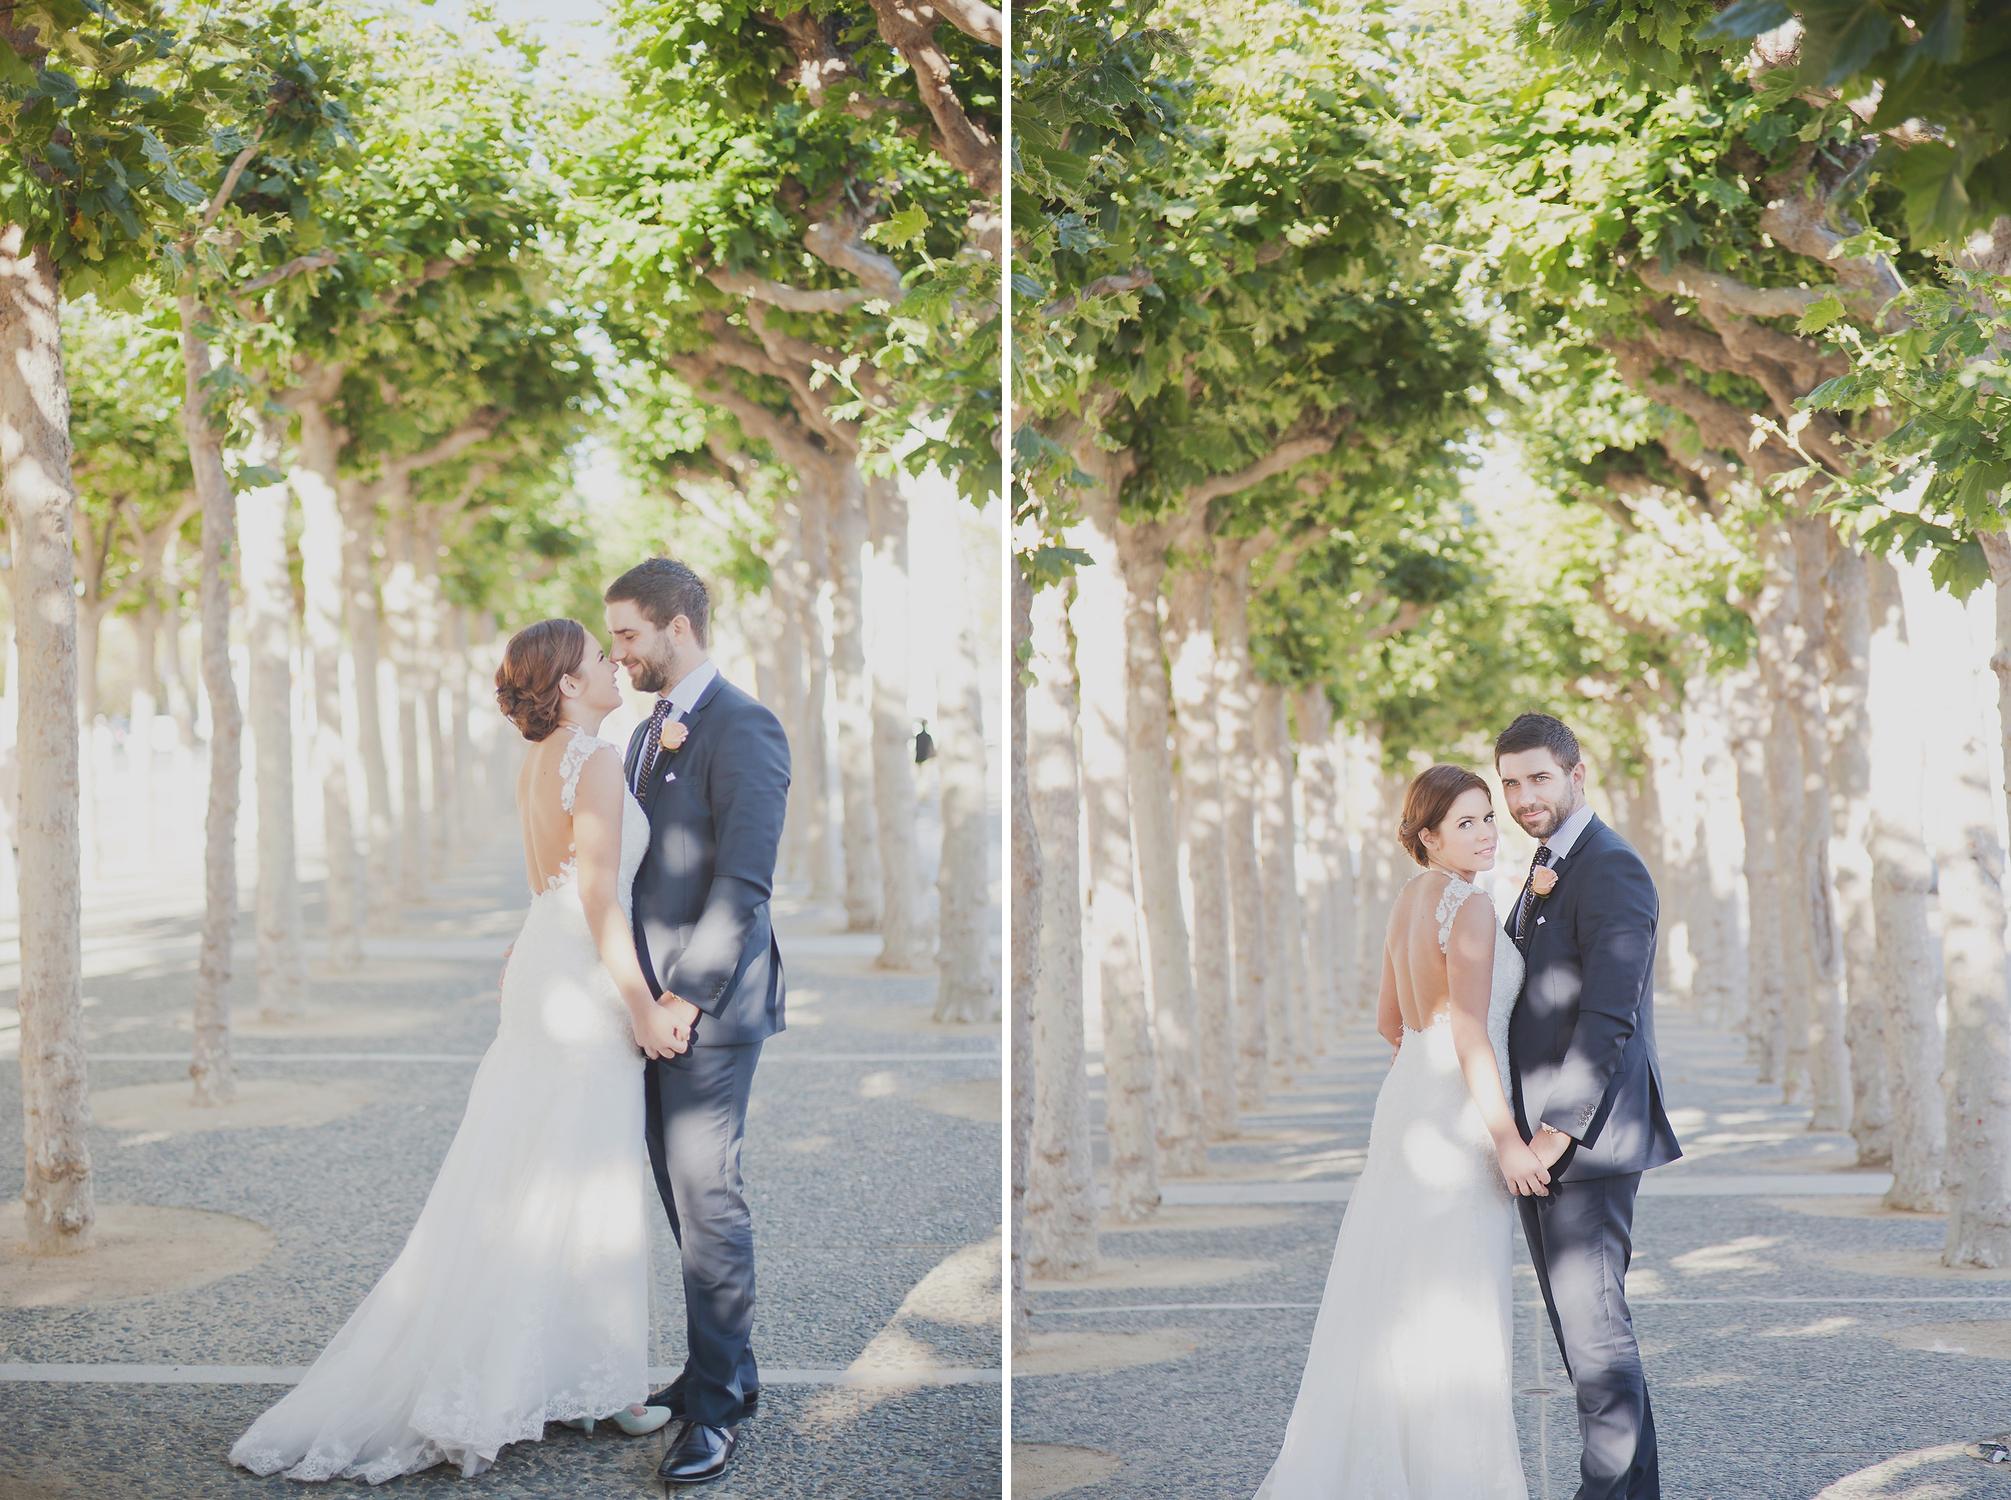 wellington wedding photography NZ - 0274.JPG